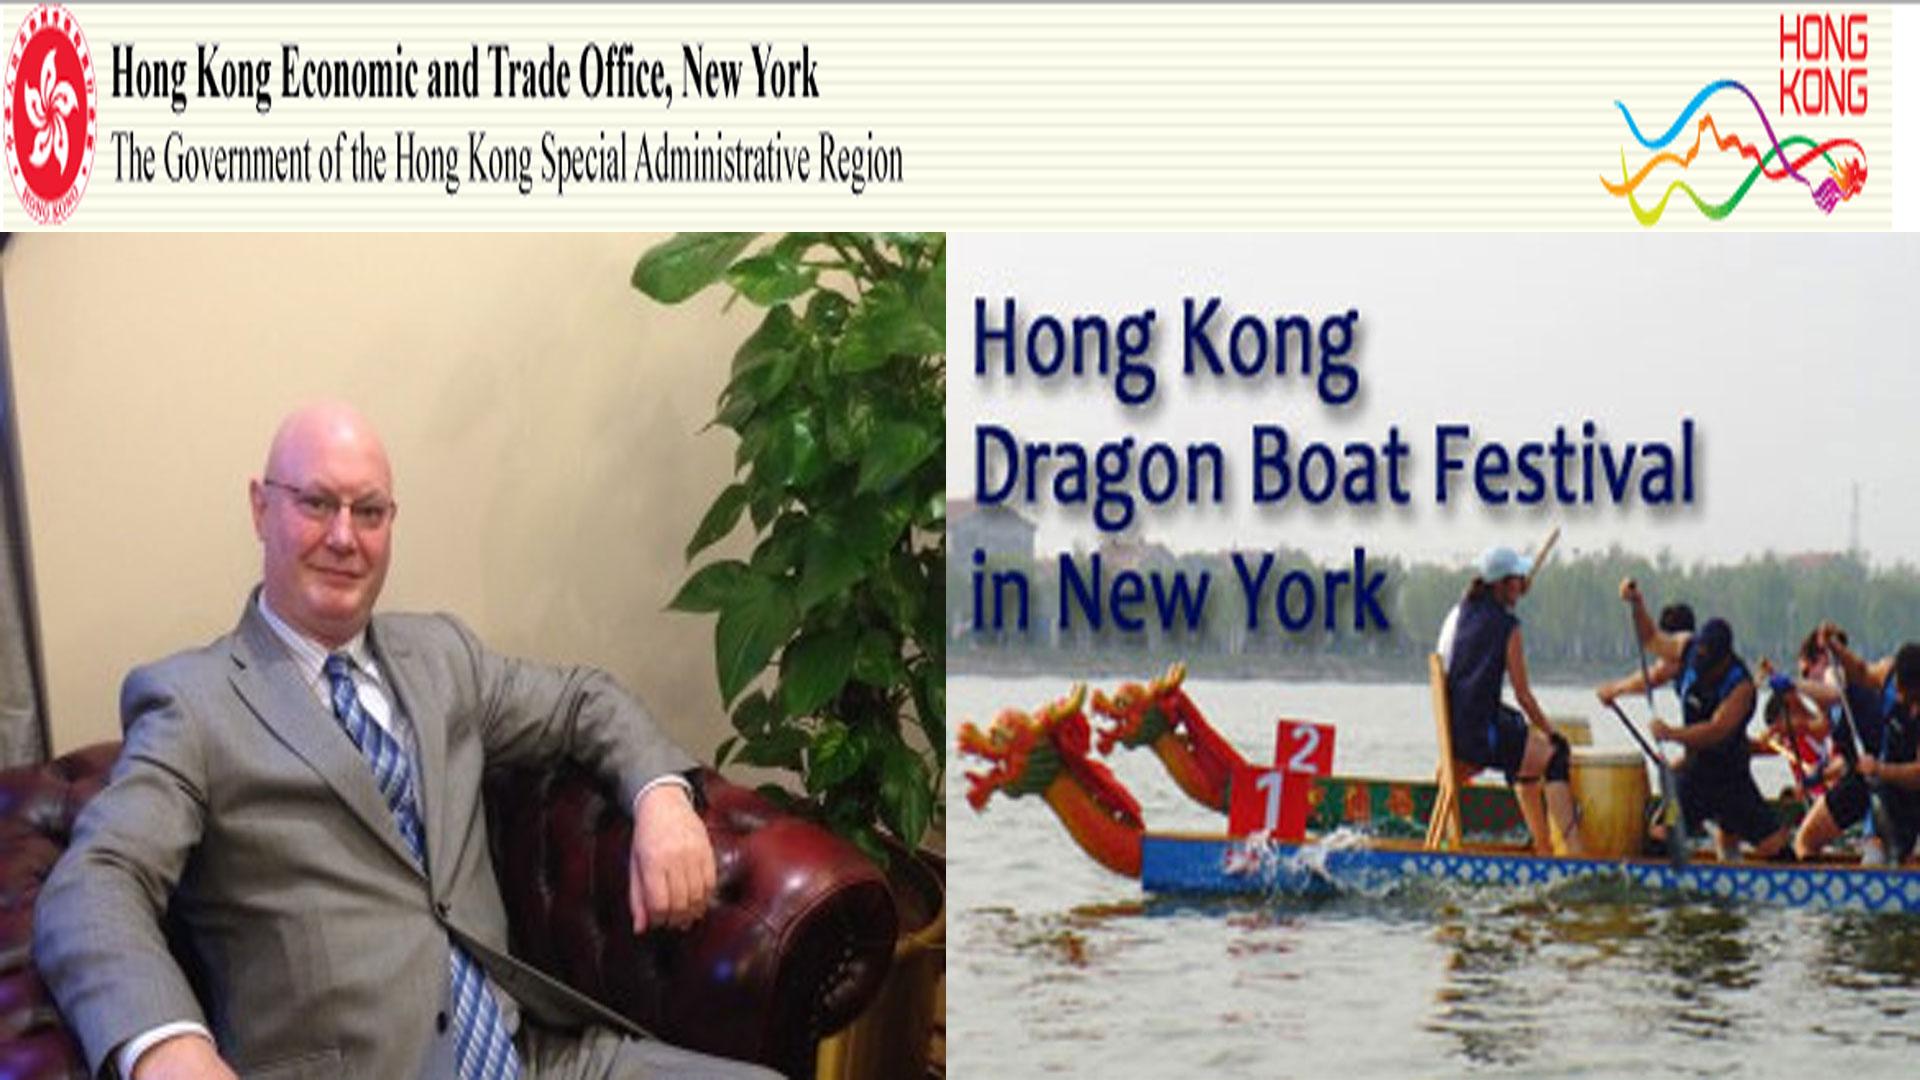 24TH ANNUAL HONG KONG DRAGON BOAT FESTIVAL, STEVE BARCLAY